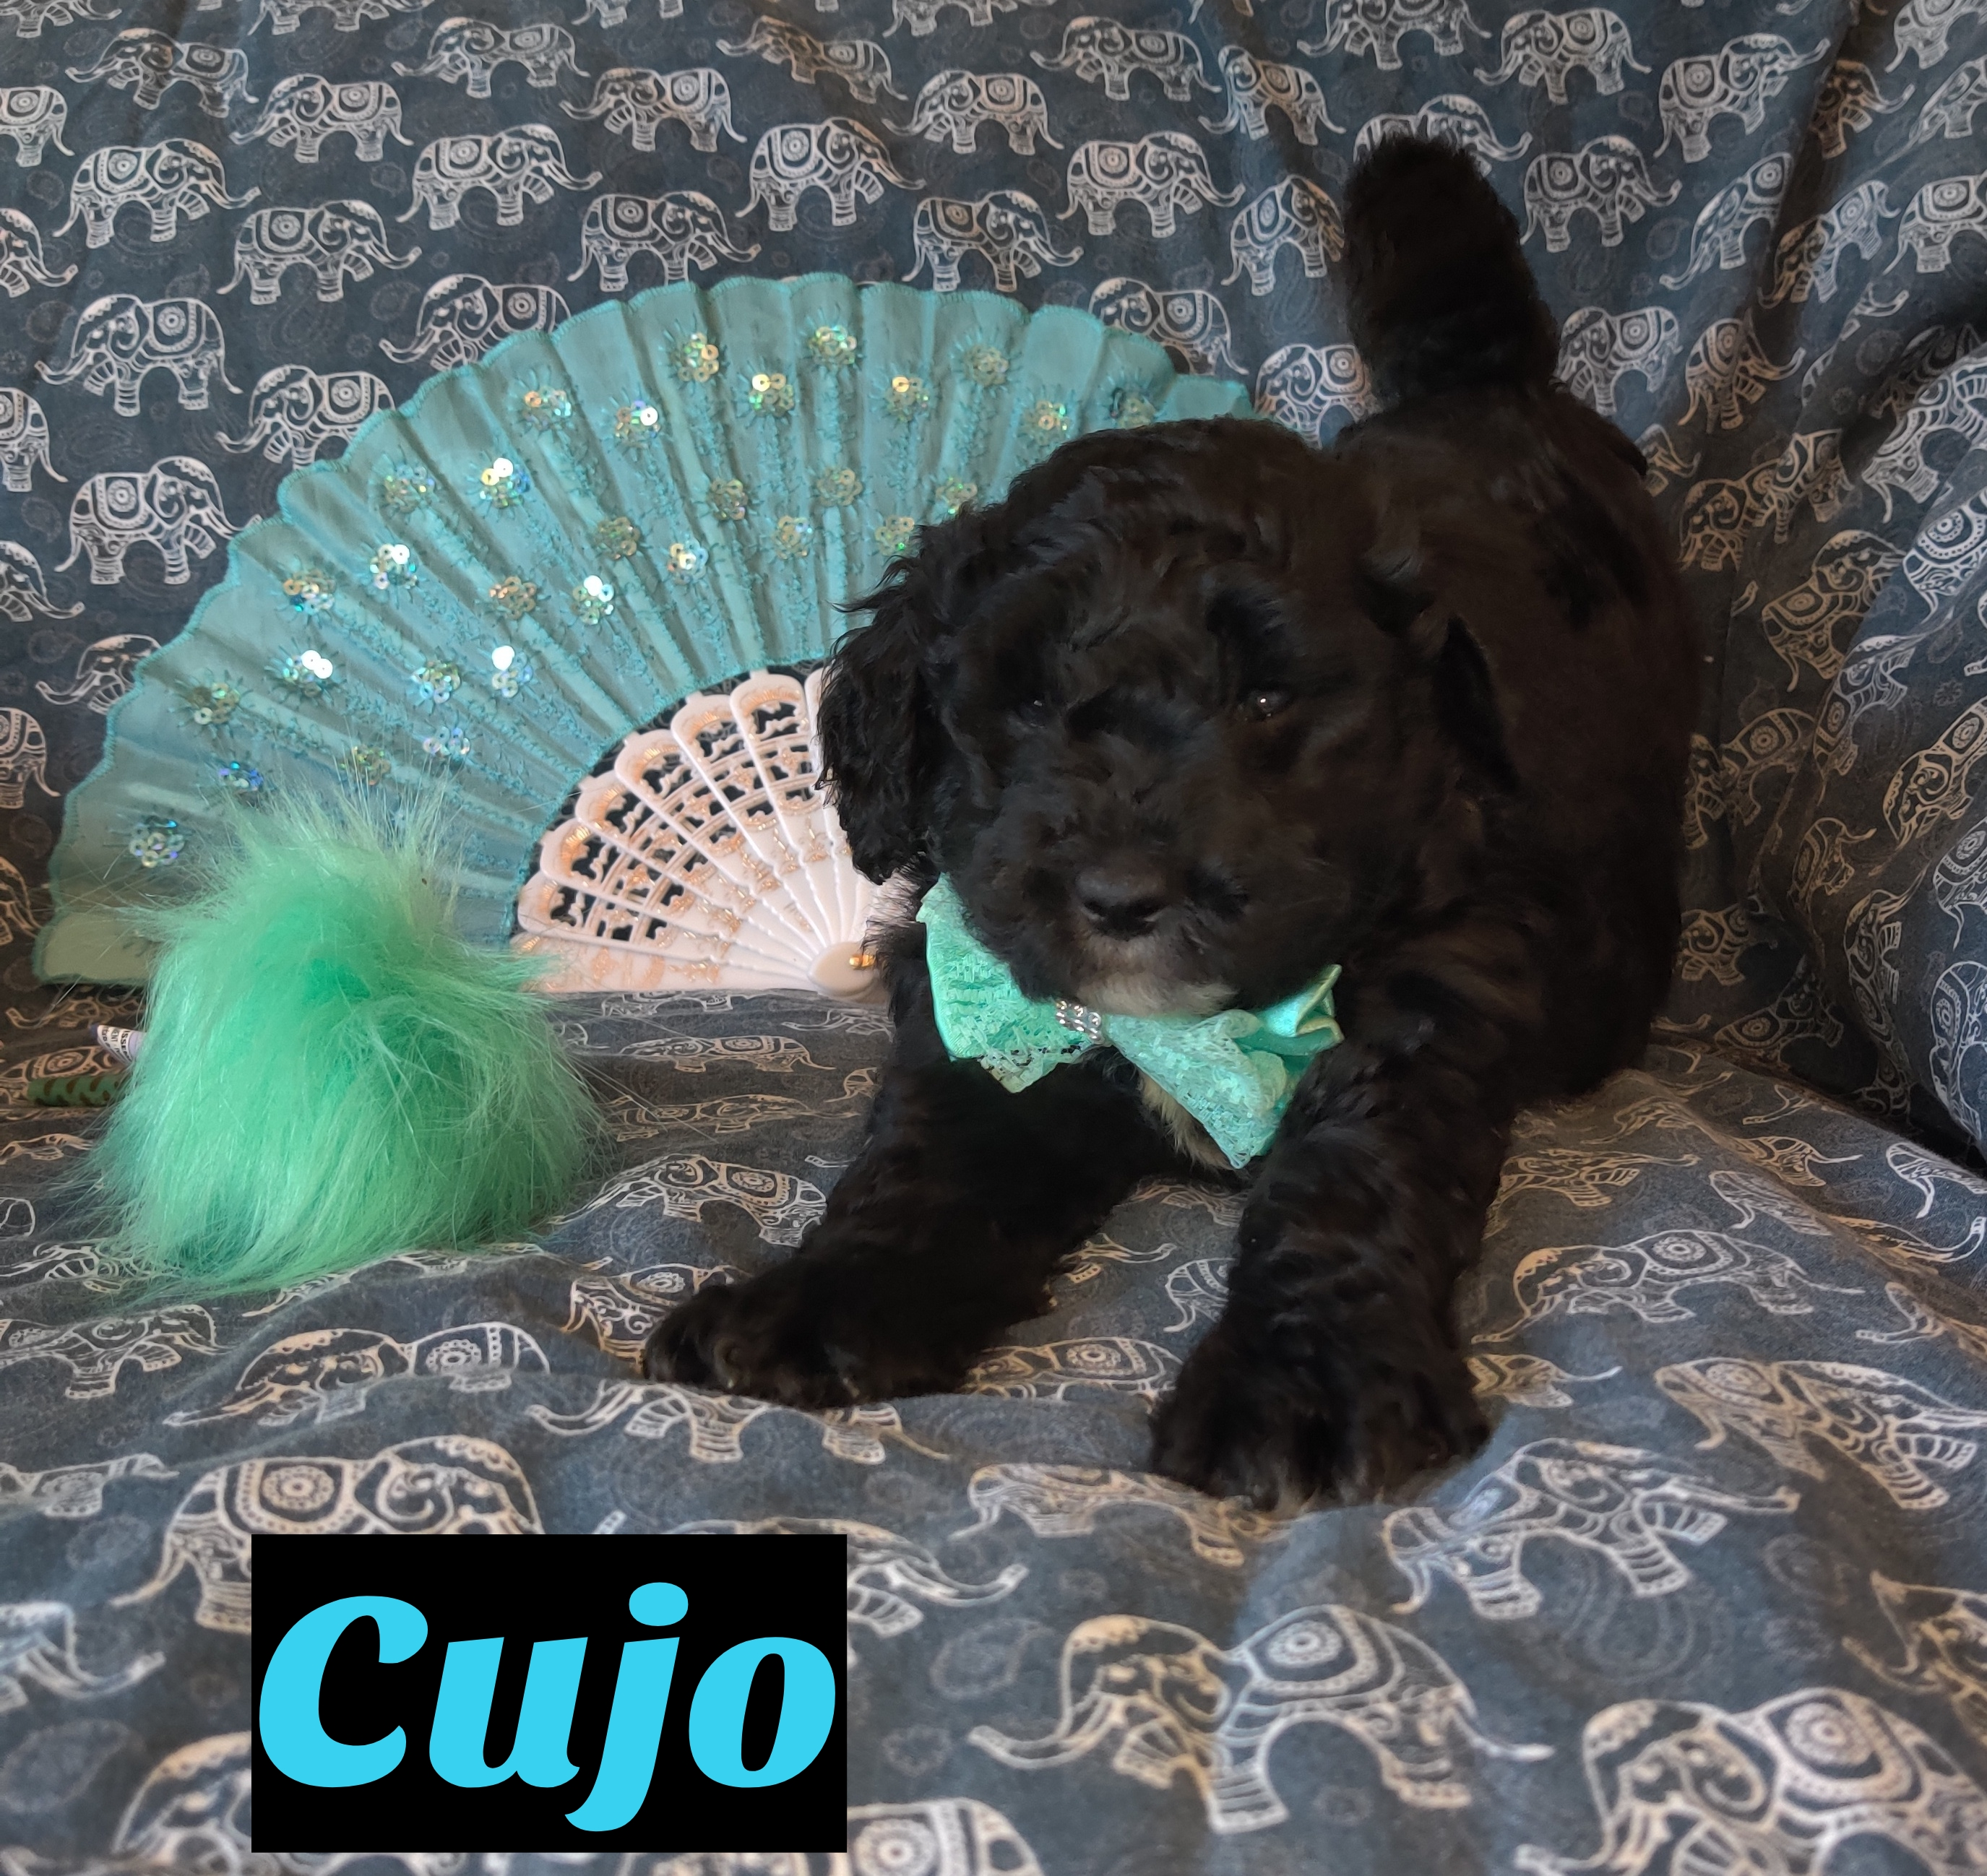 Cujo Mini Goldendoodle Pupper For Sale At Saint Cloud Florida